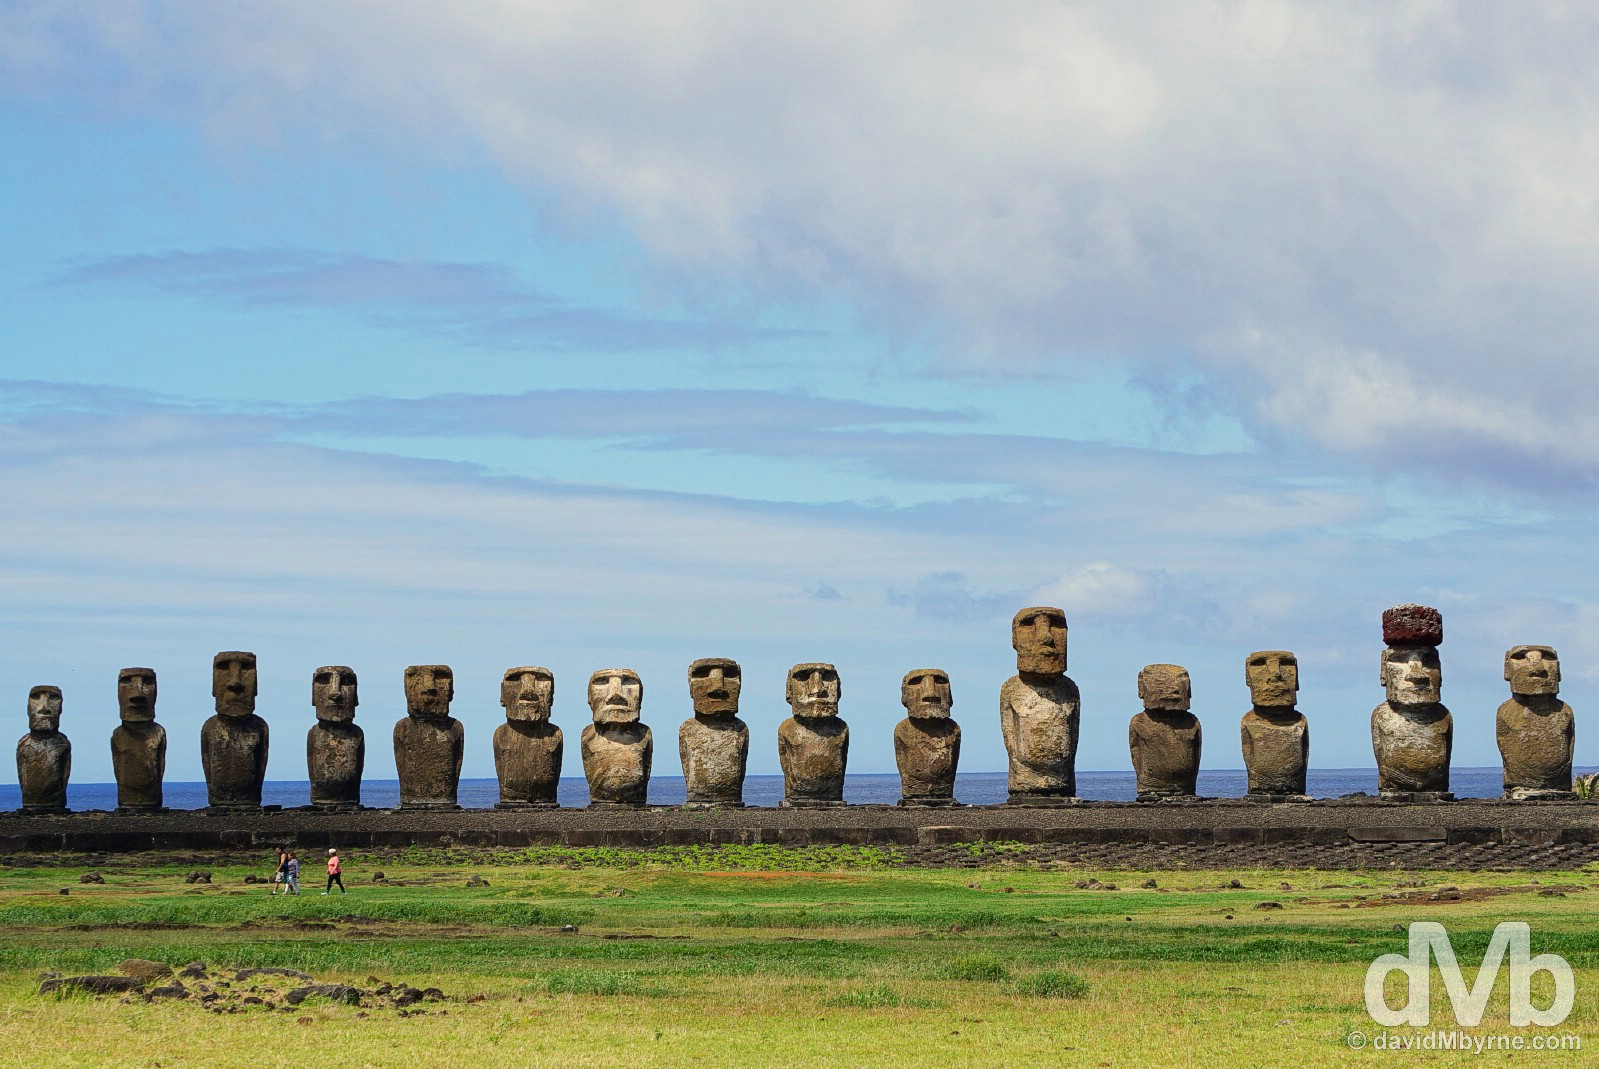 The 15 moai of Ahu Tongariki, Easter Island, Chile. October 1, 2015.